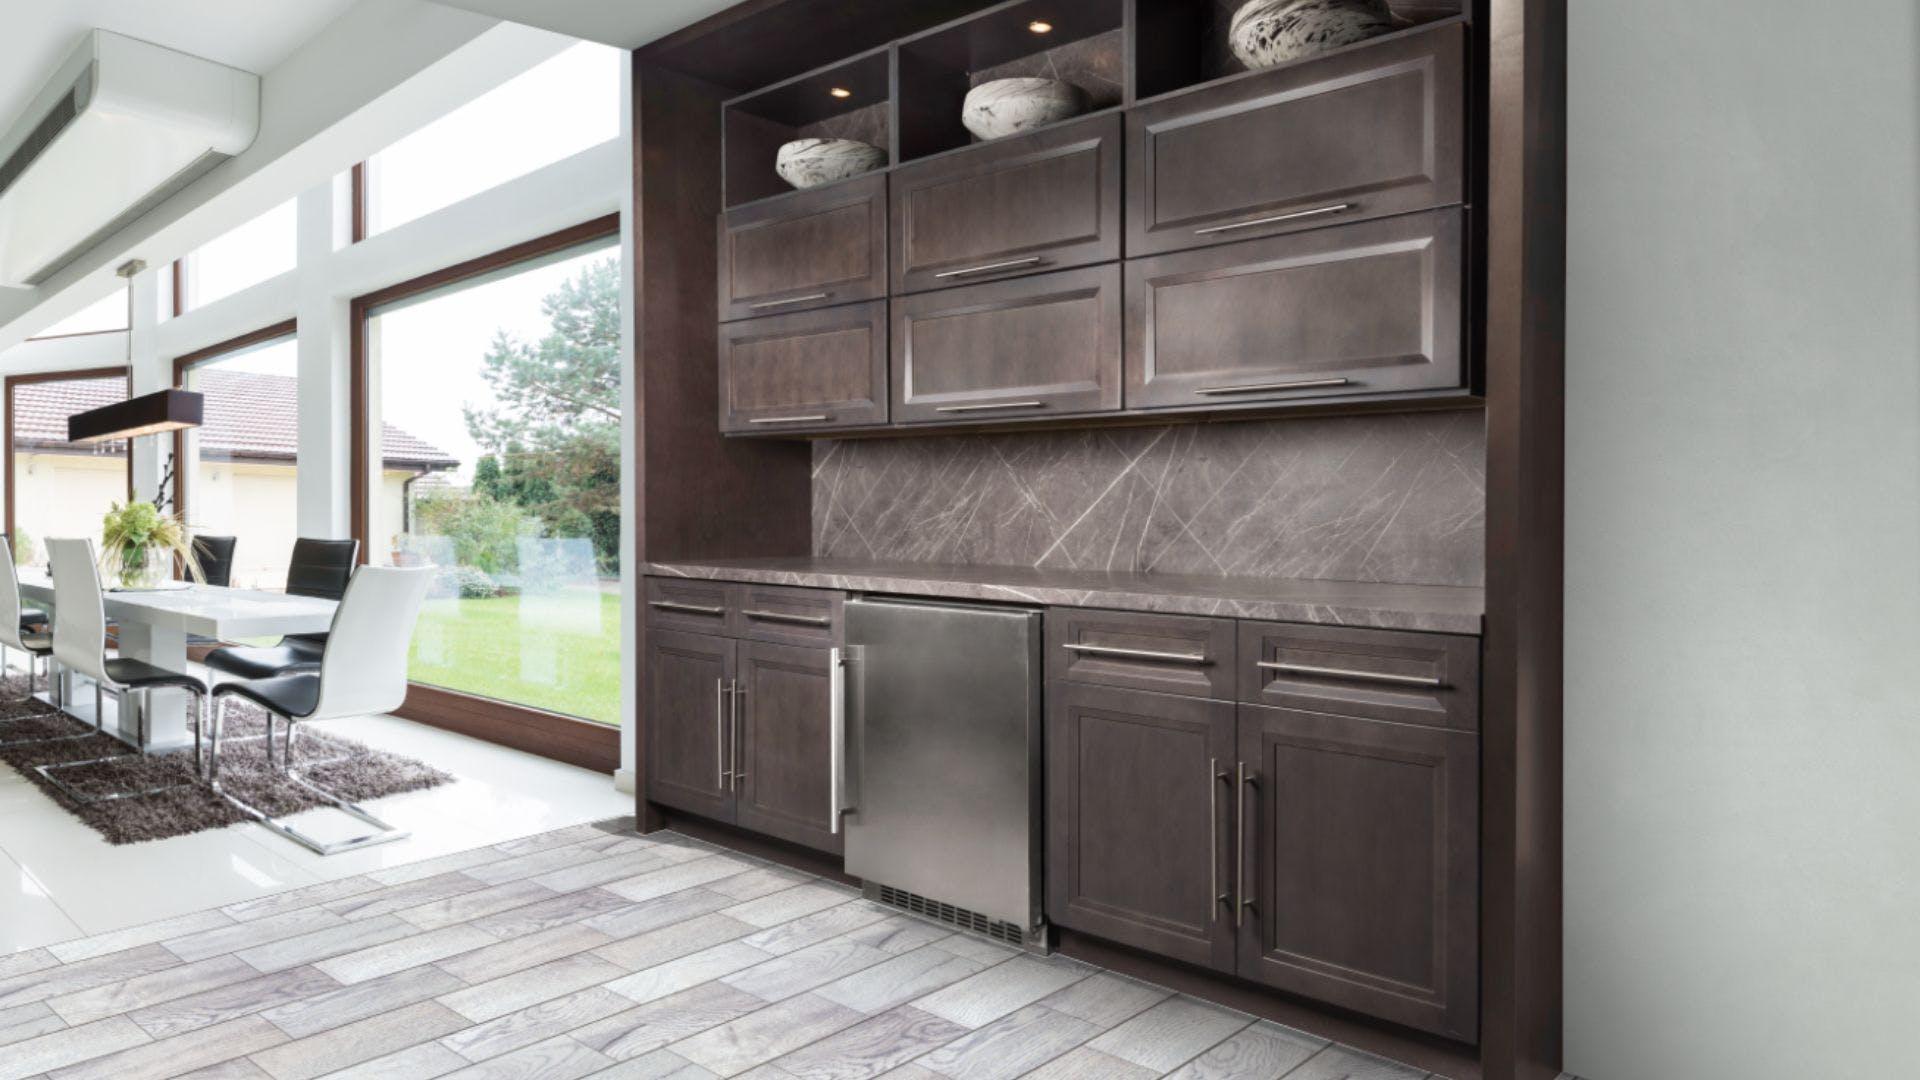 Fabuwood Onyx Cobblestone Kitchen Cabinets [Quality Craftsmanship]